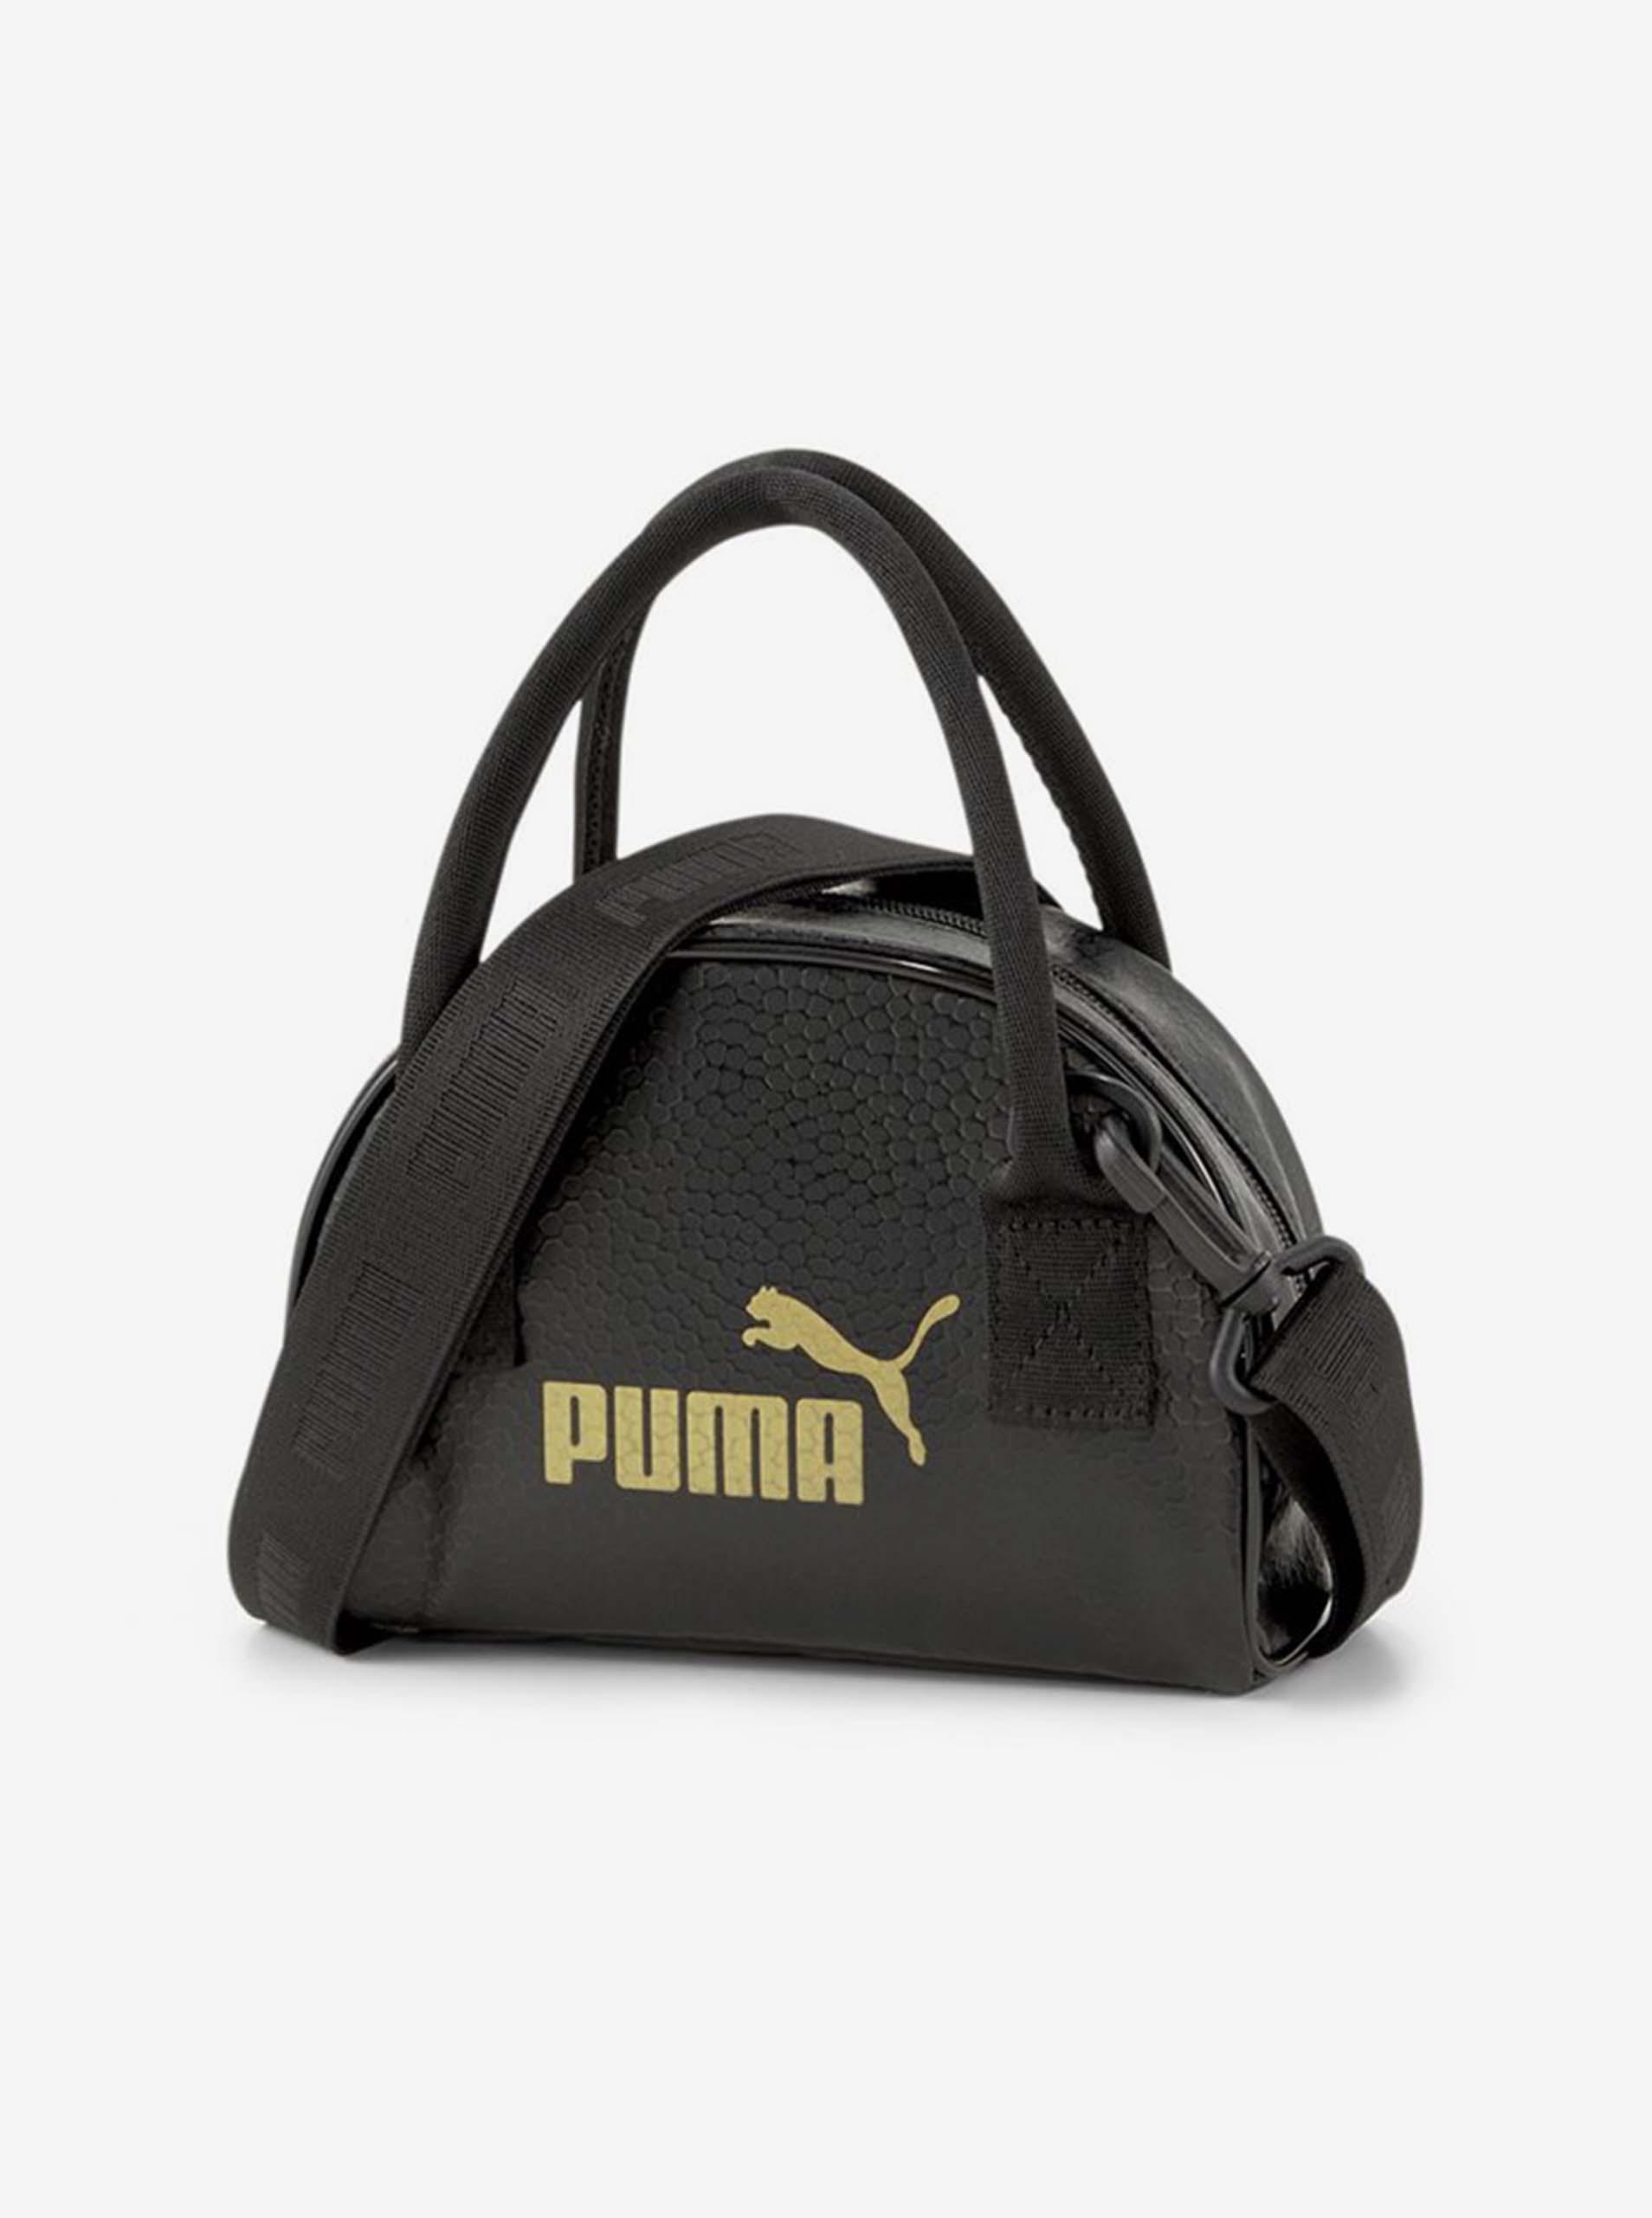 Puma Torebka damska czarny